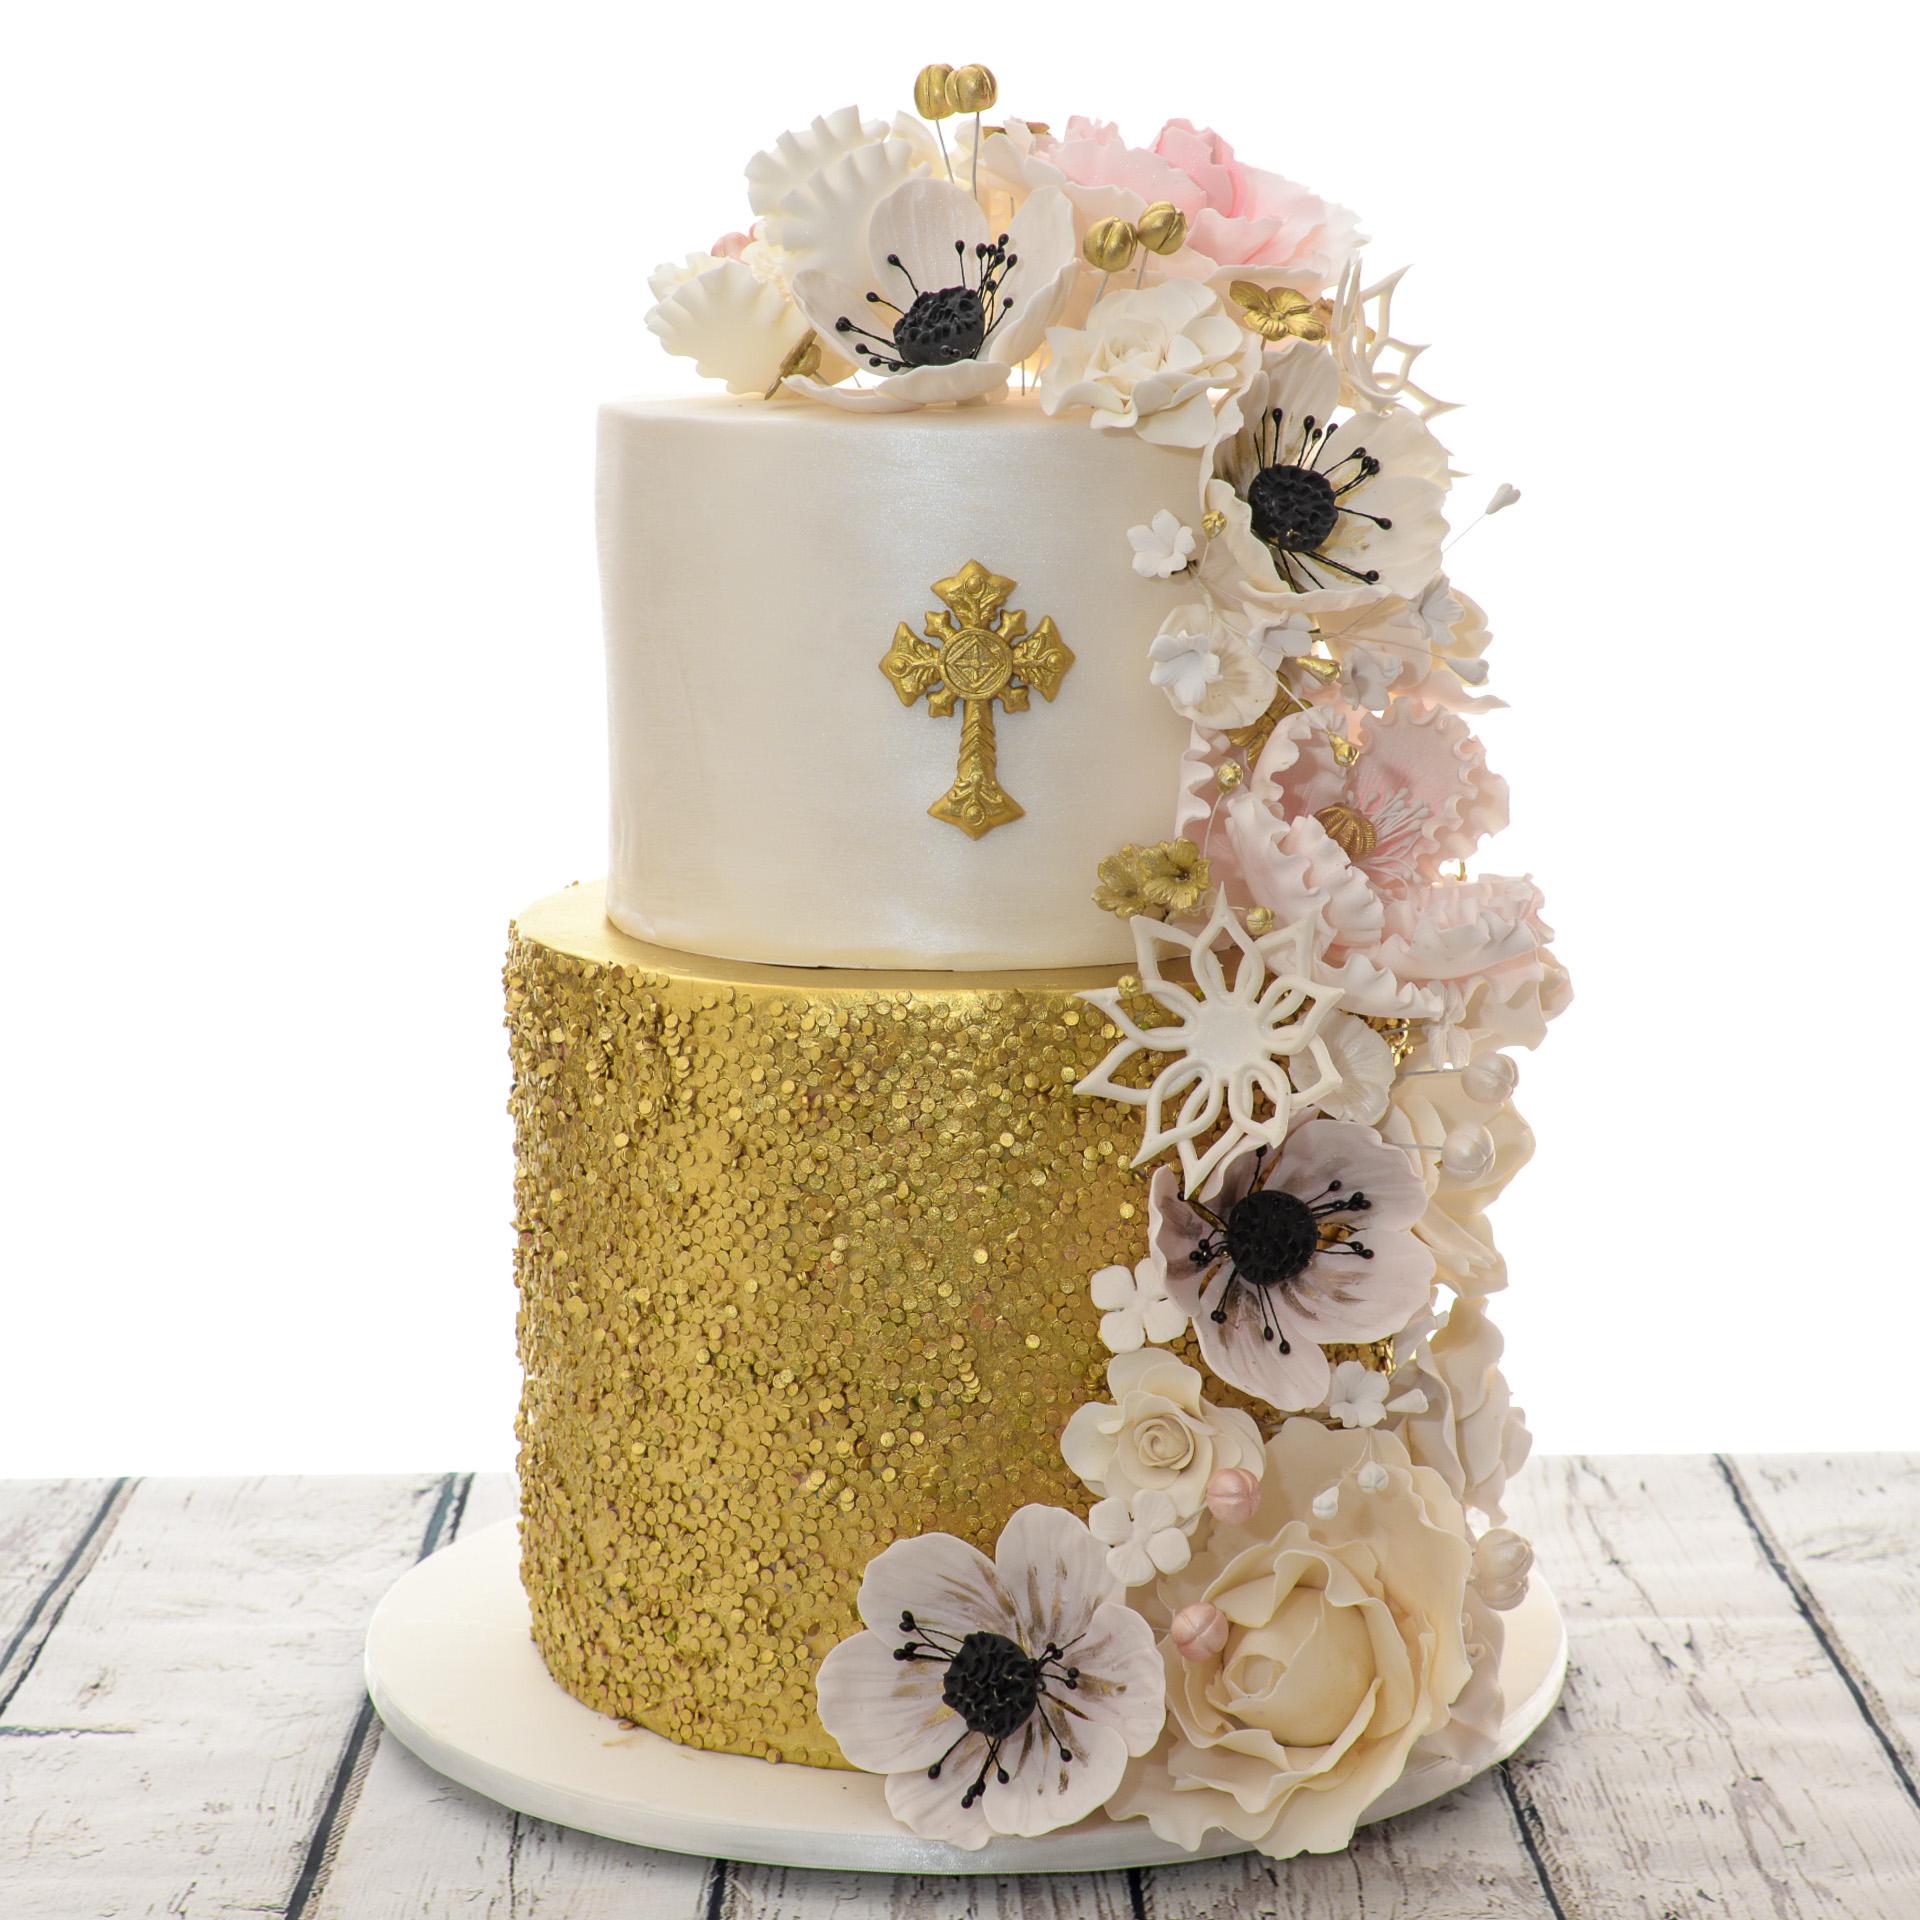 White-and-Gold-Sequin-Flowers-Christening-Religious-Cake.jpg